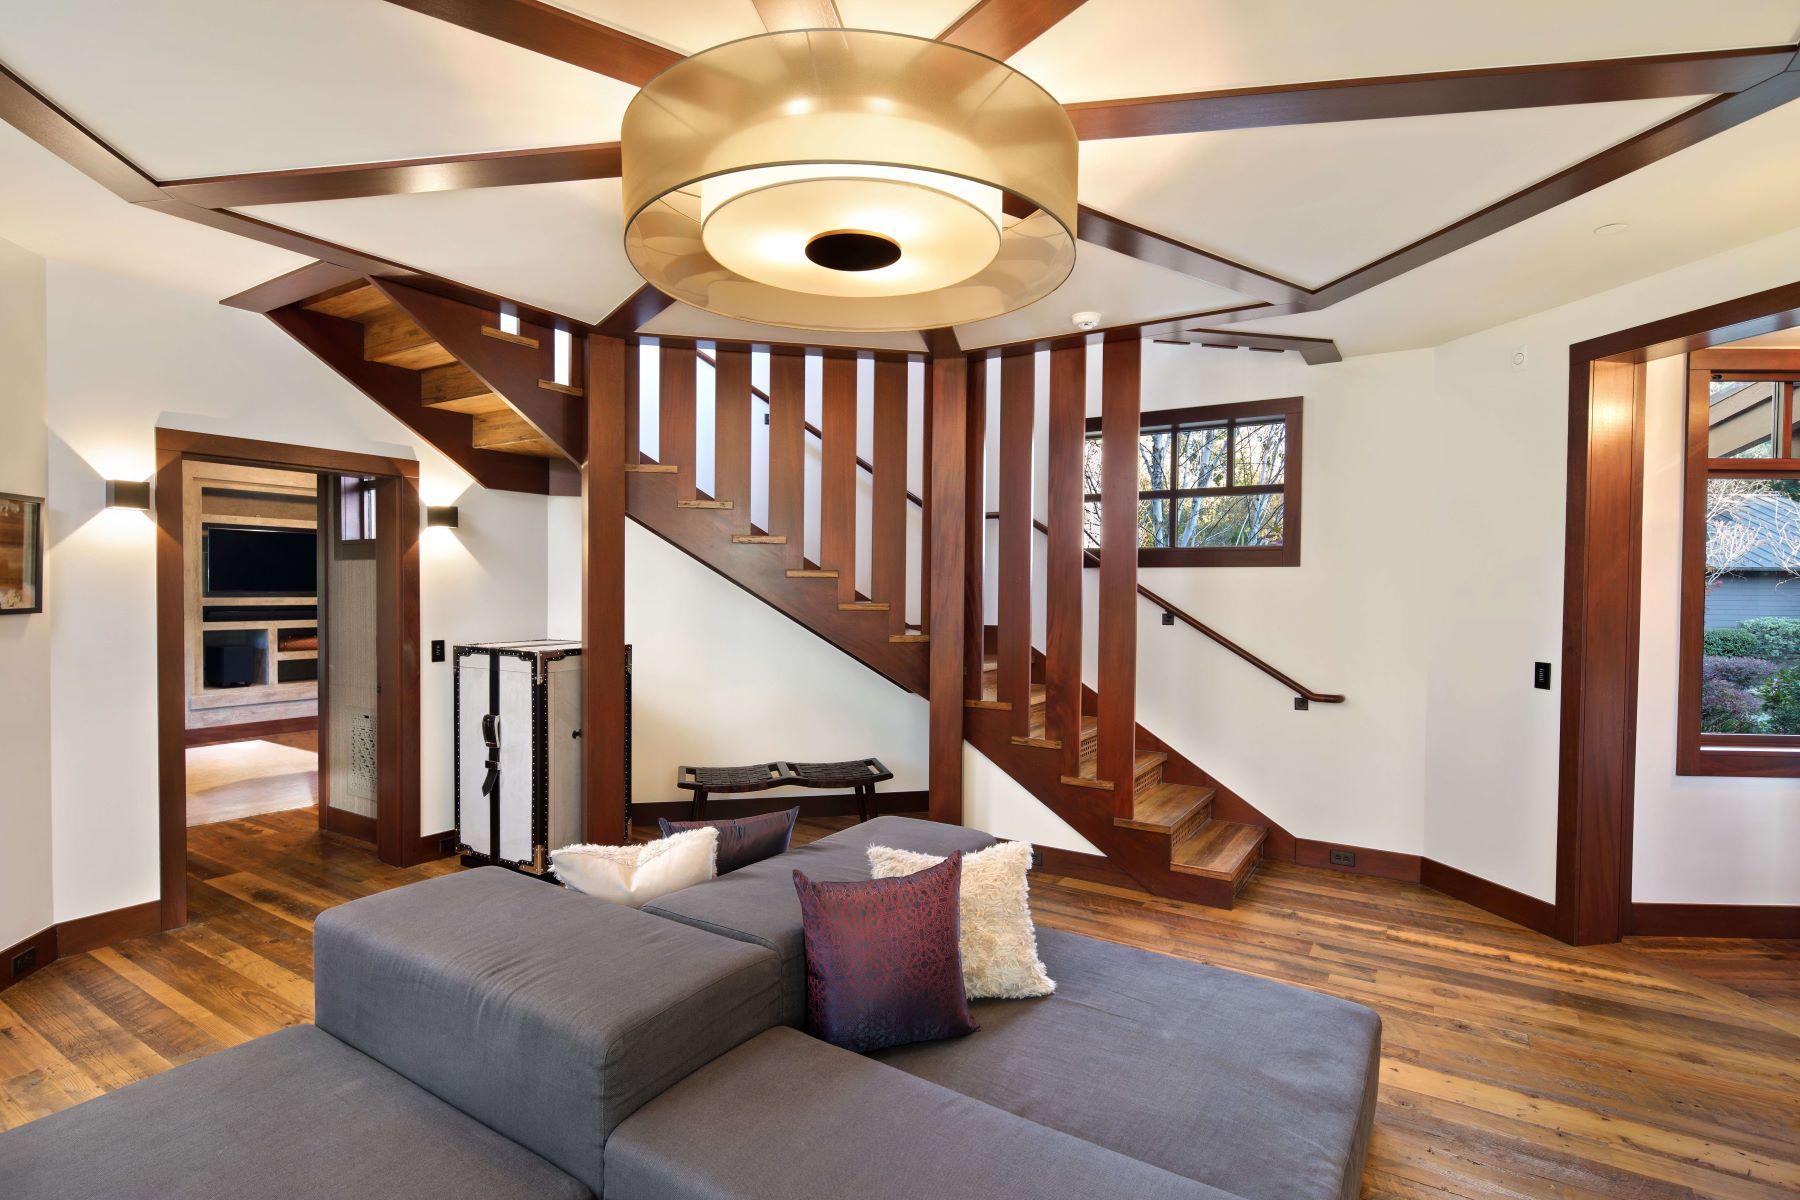 Additional photo for property listing at Woodside Estate 15 Hidden Valley Ln Woodside, California 94062 Estados Unidos